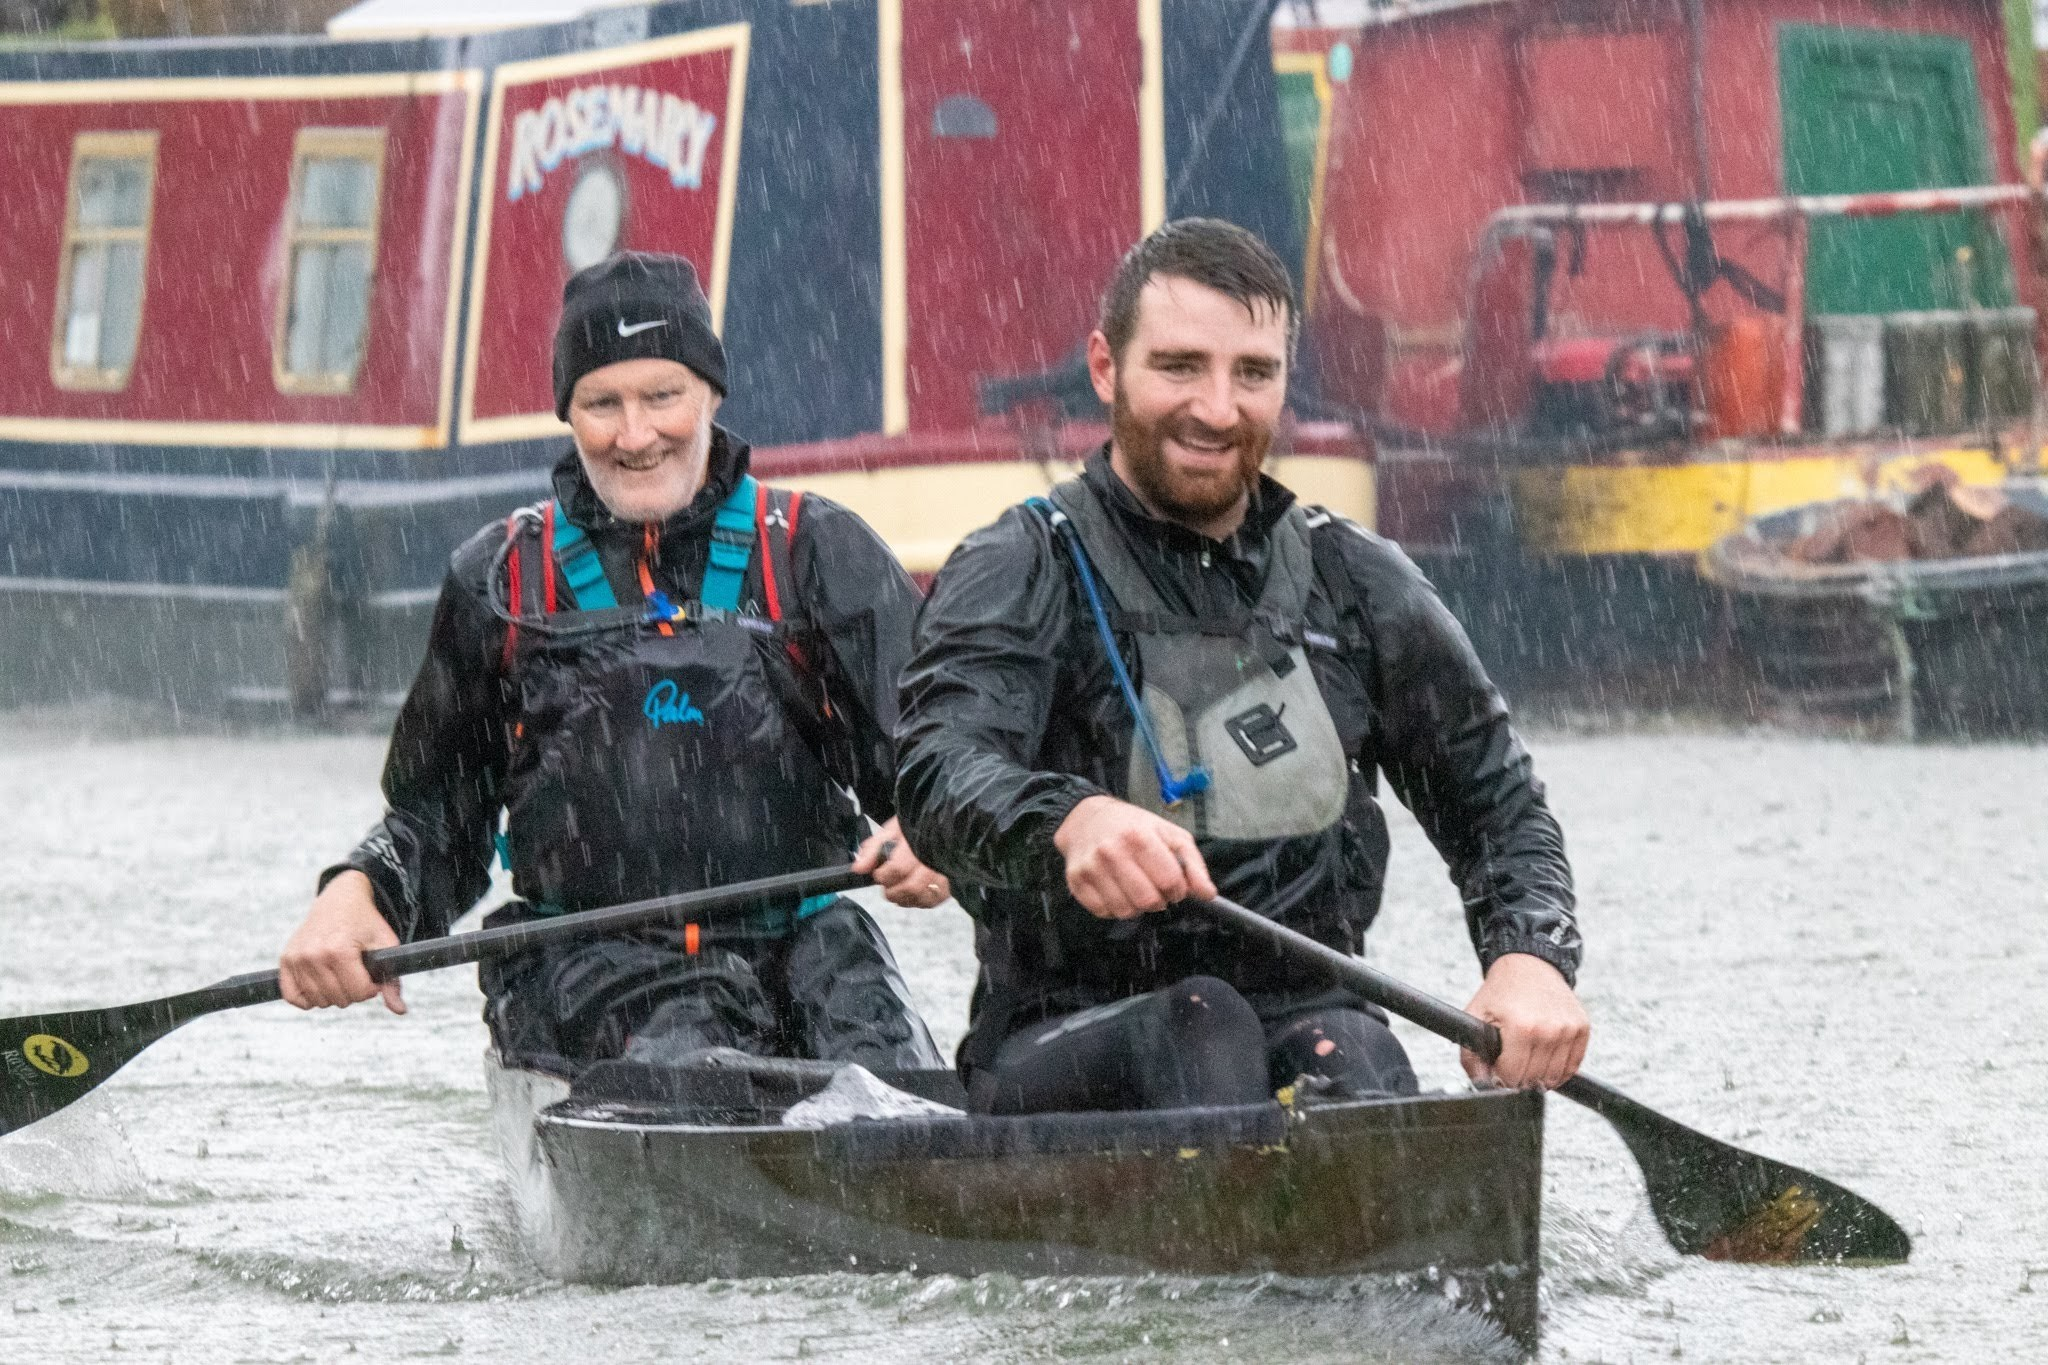 Terminally ill paddler takes on epic canoe race